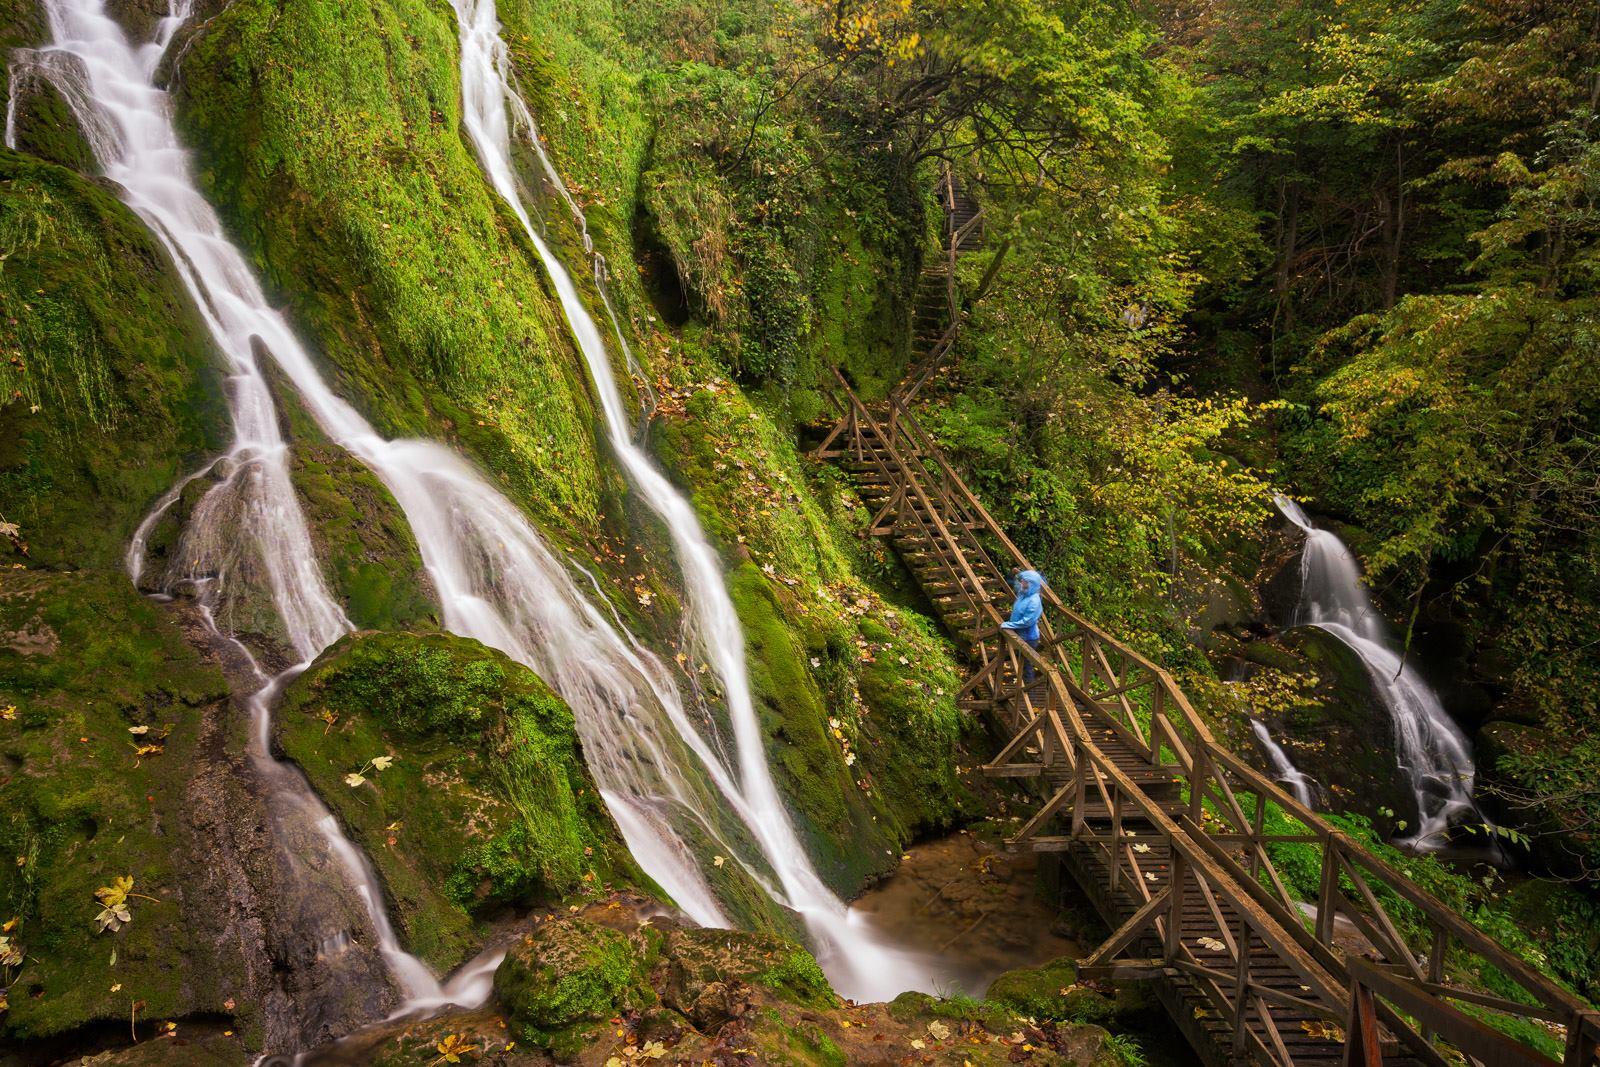 Park prirode Papuk otvara svoja vrata od 11. svibnja - Park prirode Papuk